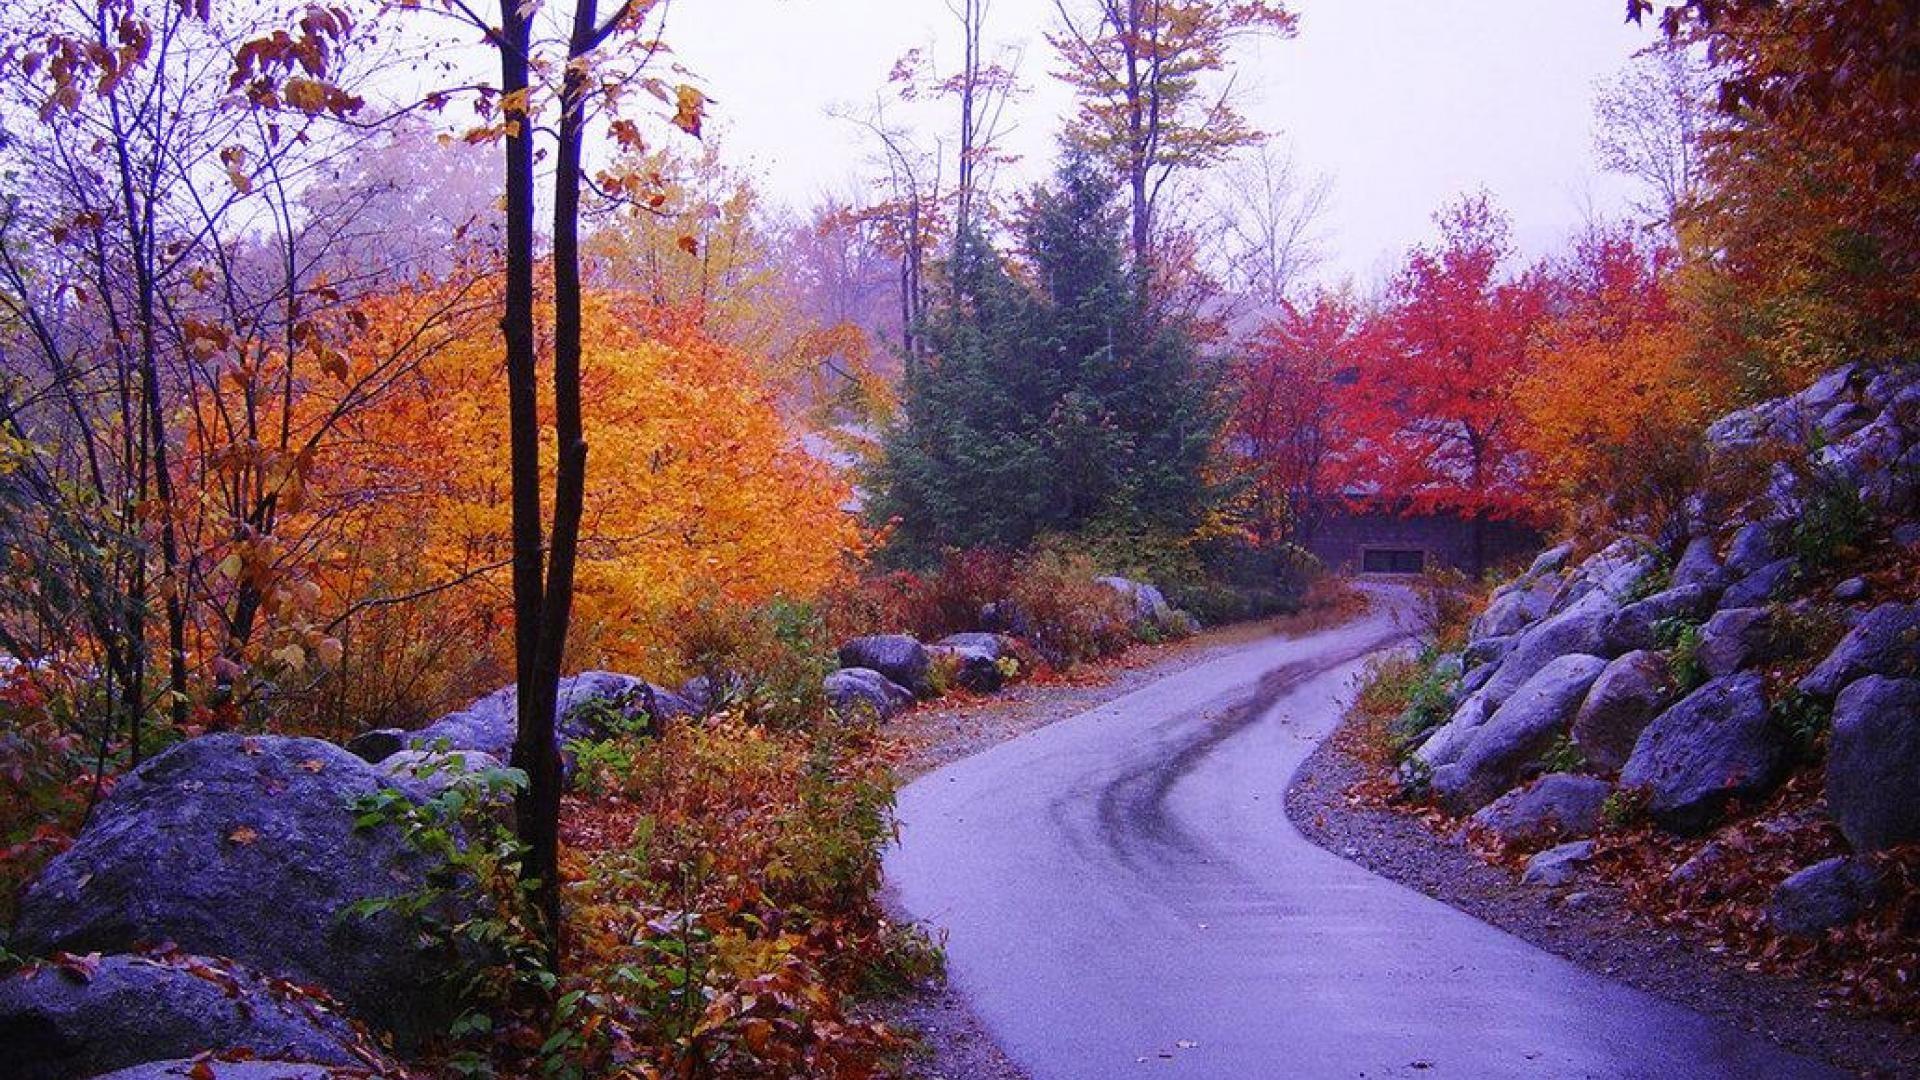 Fall Colors Wallpaper New England New England Fall Wallpaper 183 ①